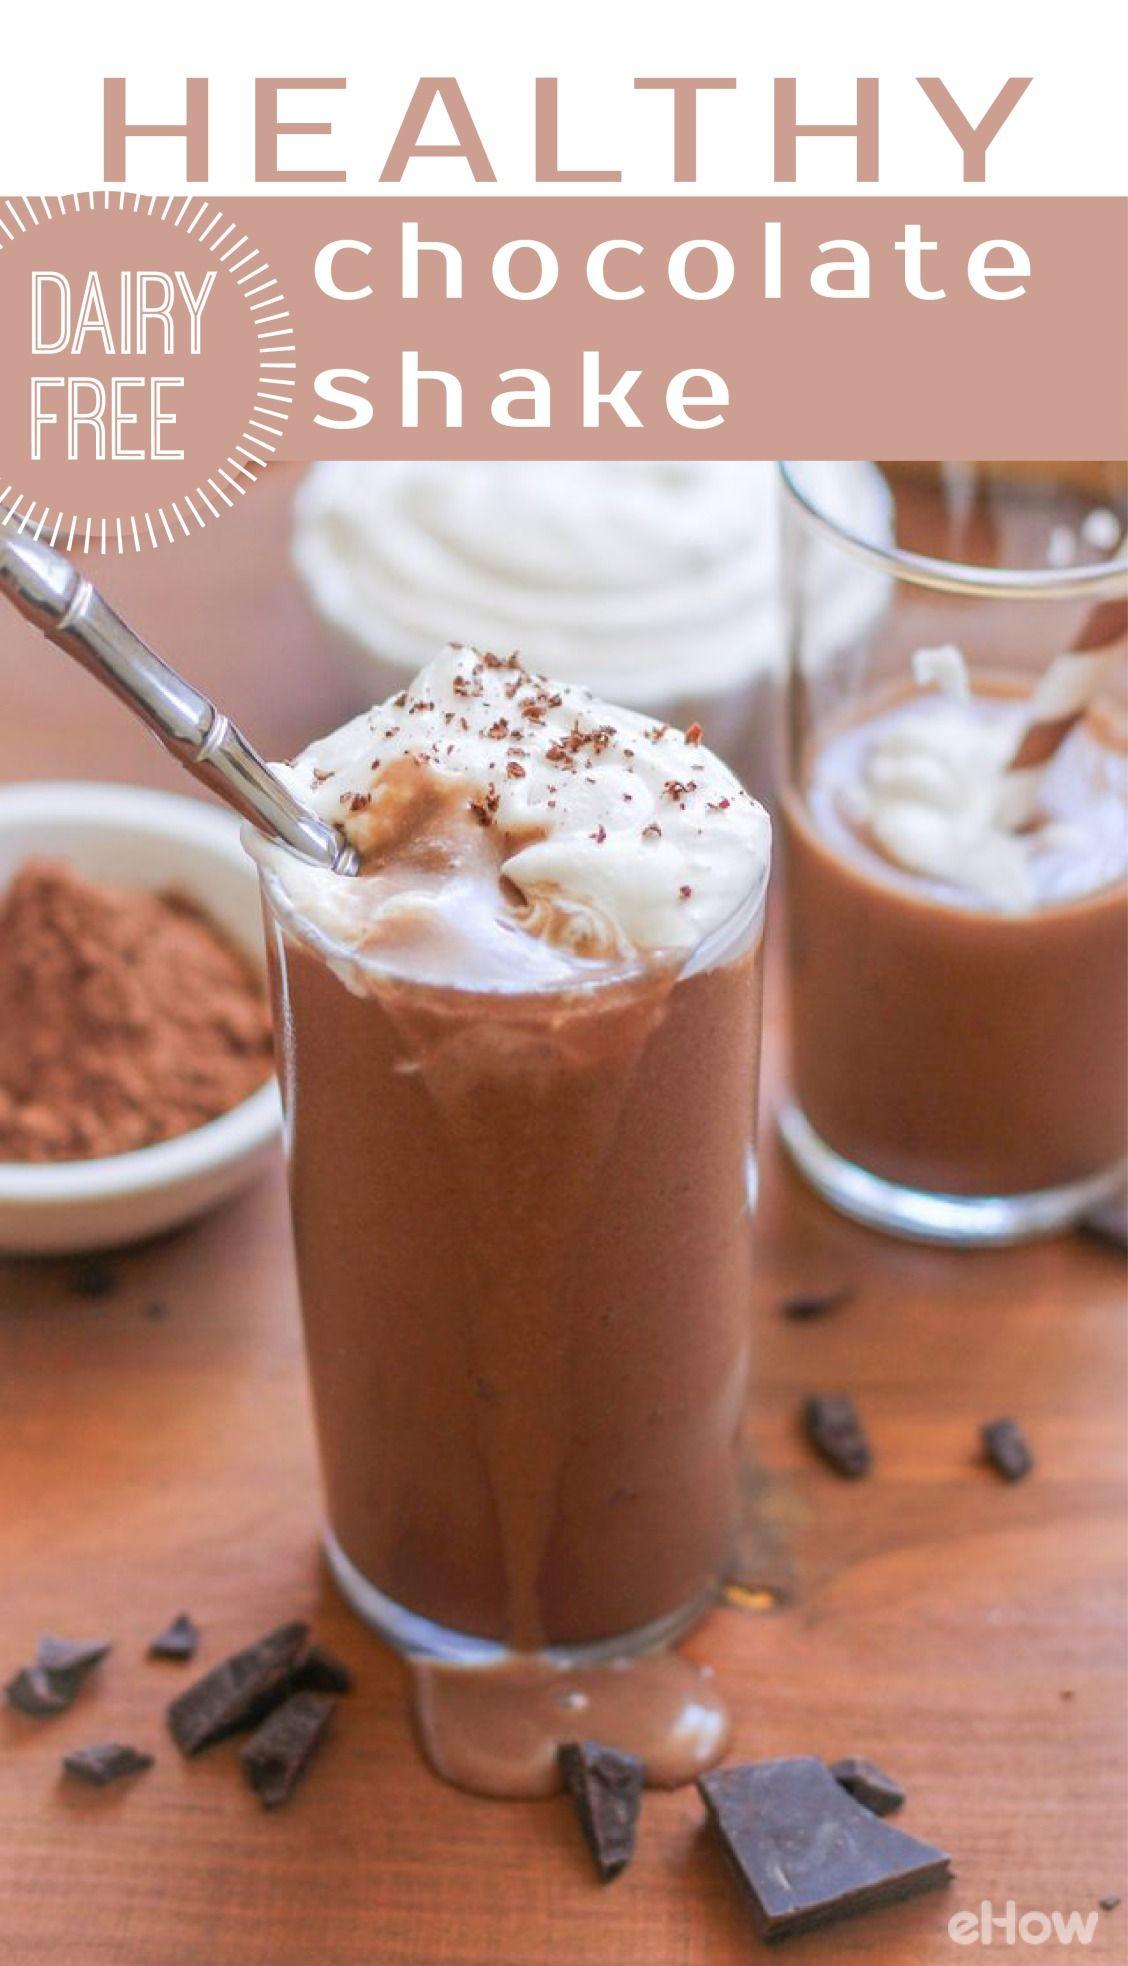 Healthy (Dairy-Free) Chocolate Shake Recipe | eHow.com #healthychocolateshakes